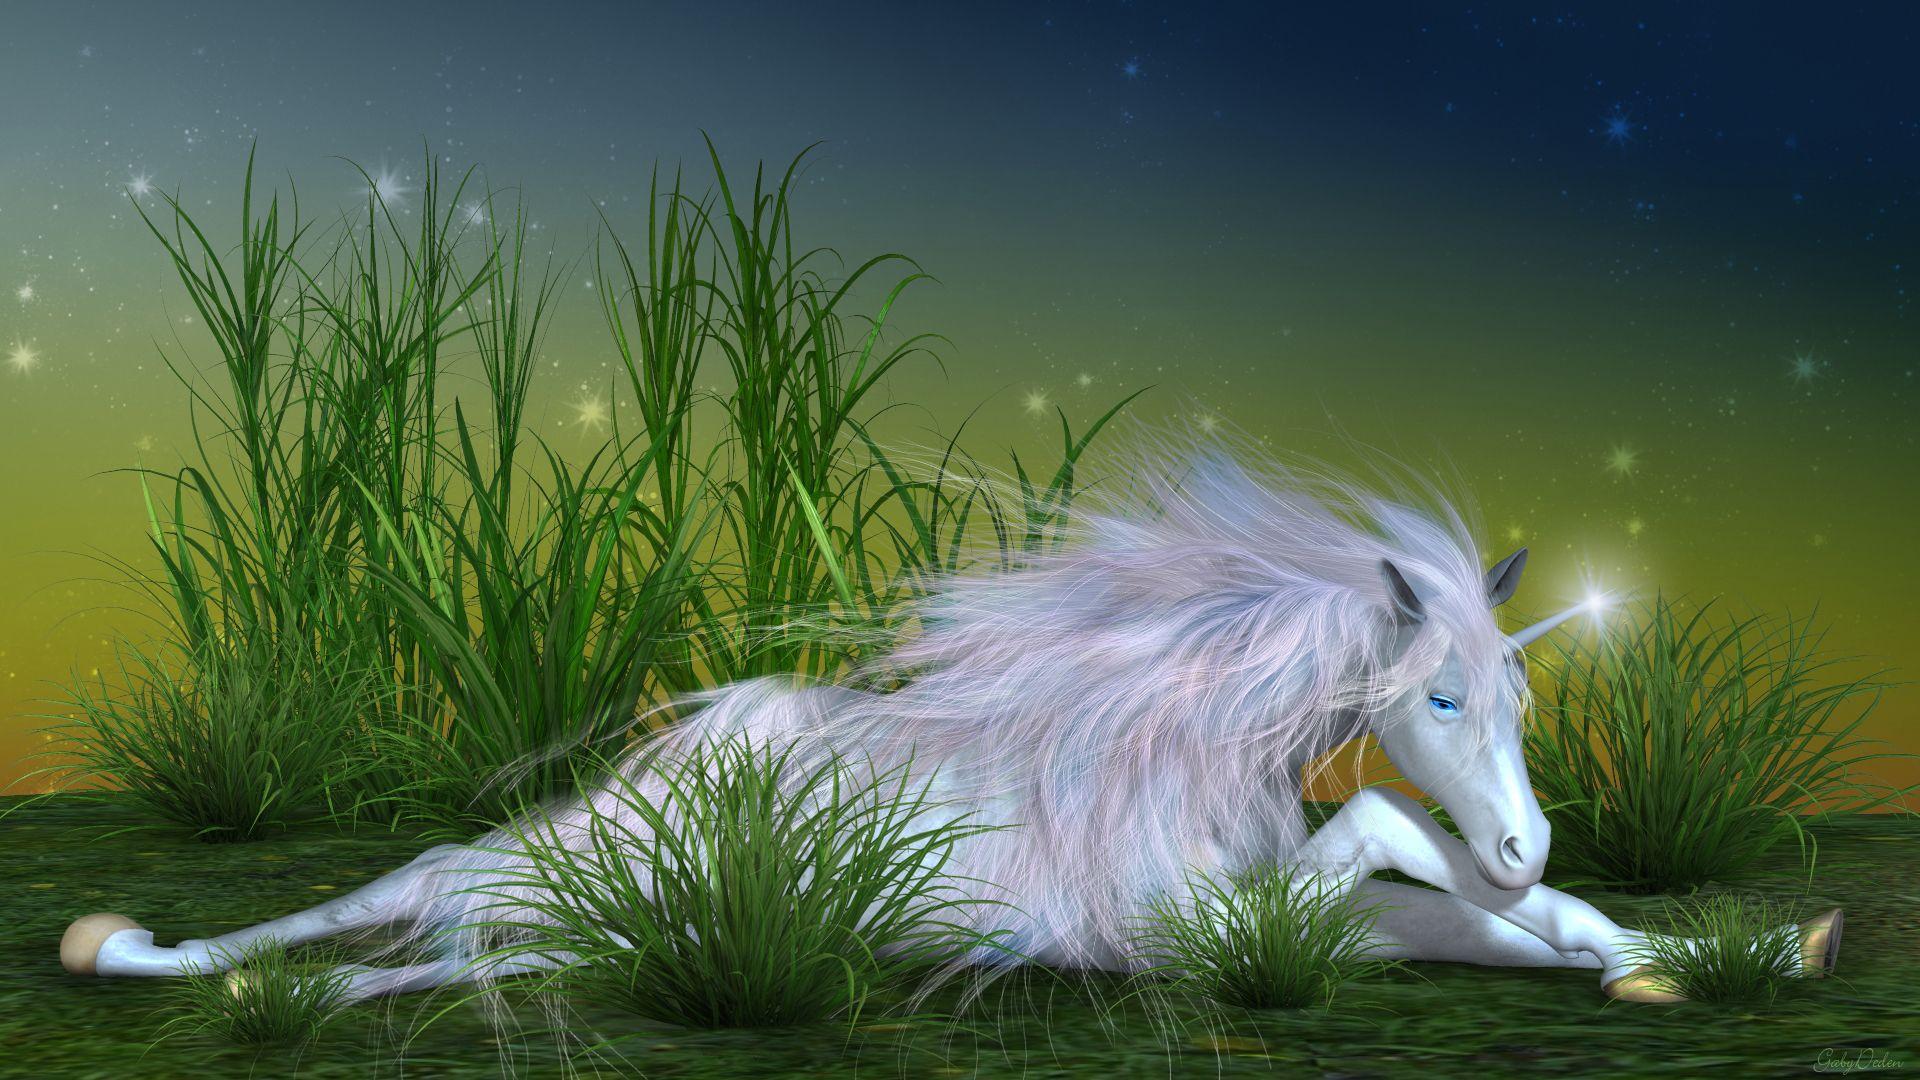 hinh nen ky lan unicorn 20